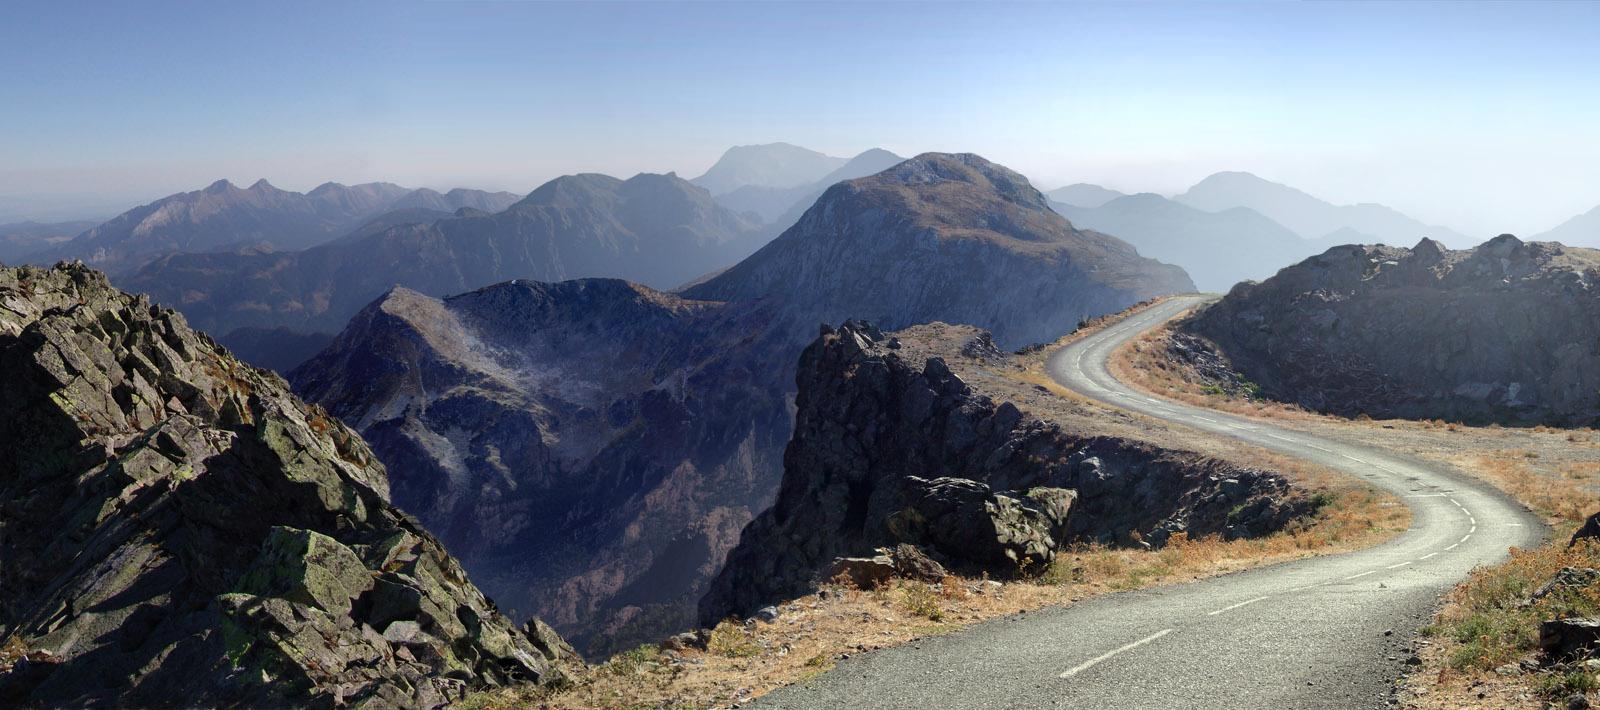 mountain road mattepainting org